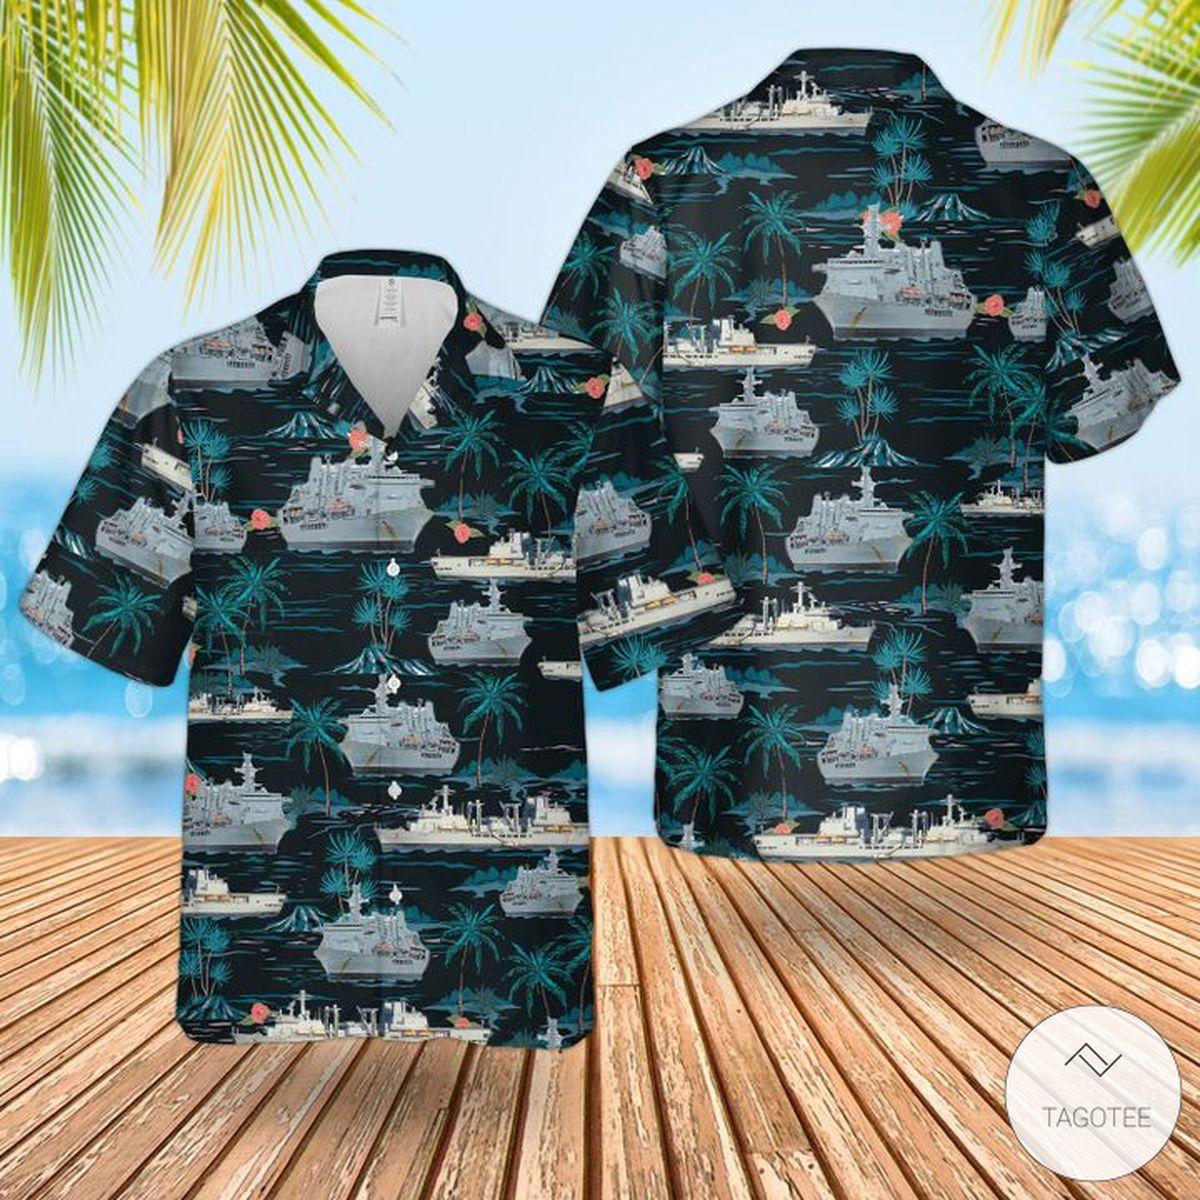 Rn Historical Rfa Fort George (A388) Hawaiian Shirt, Beach Shorts